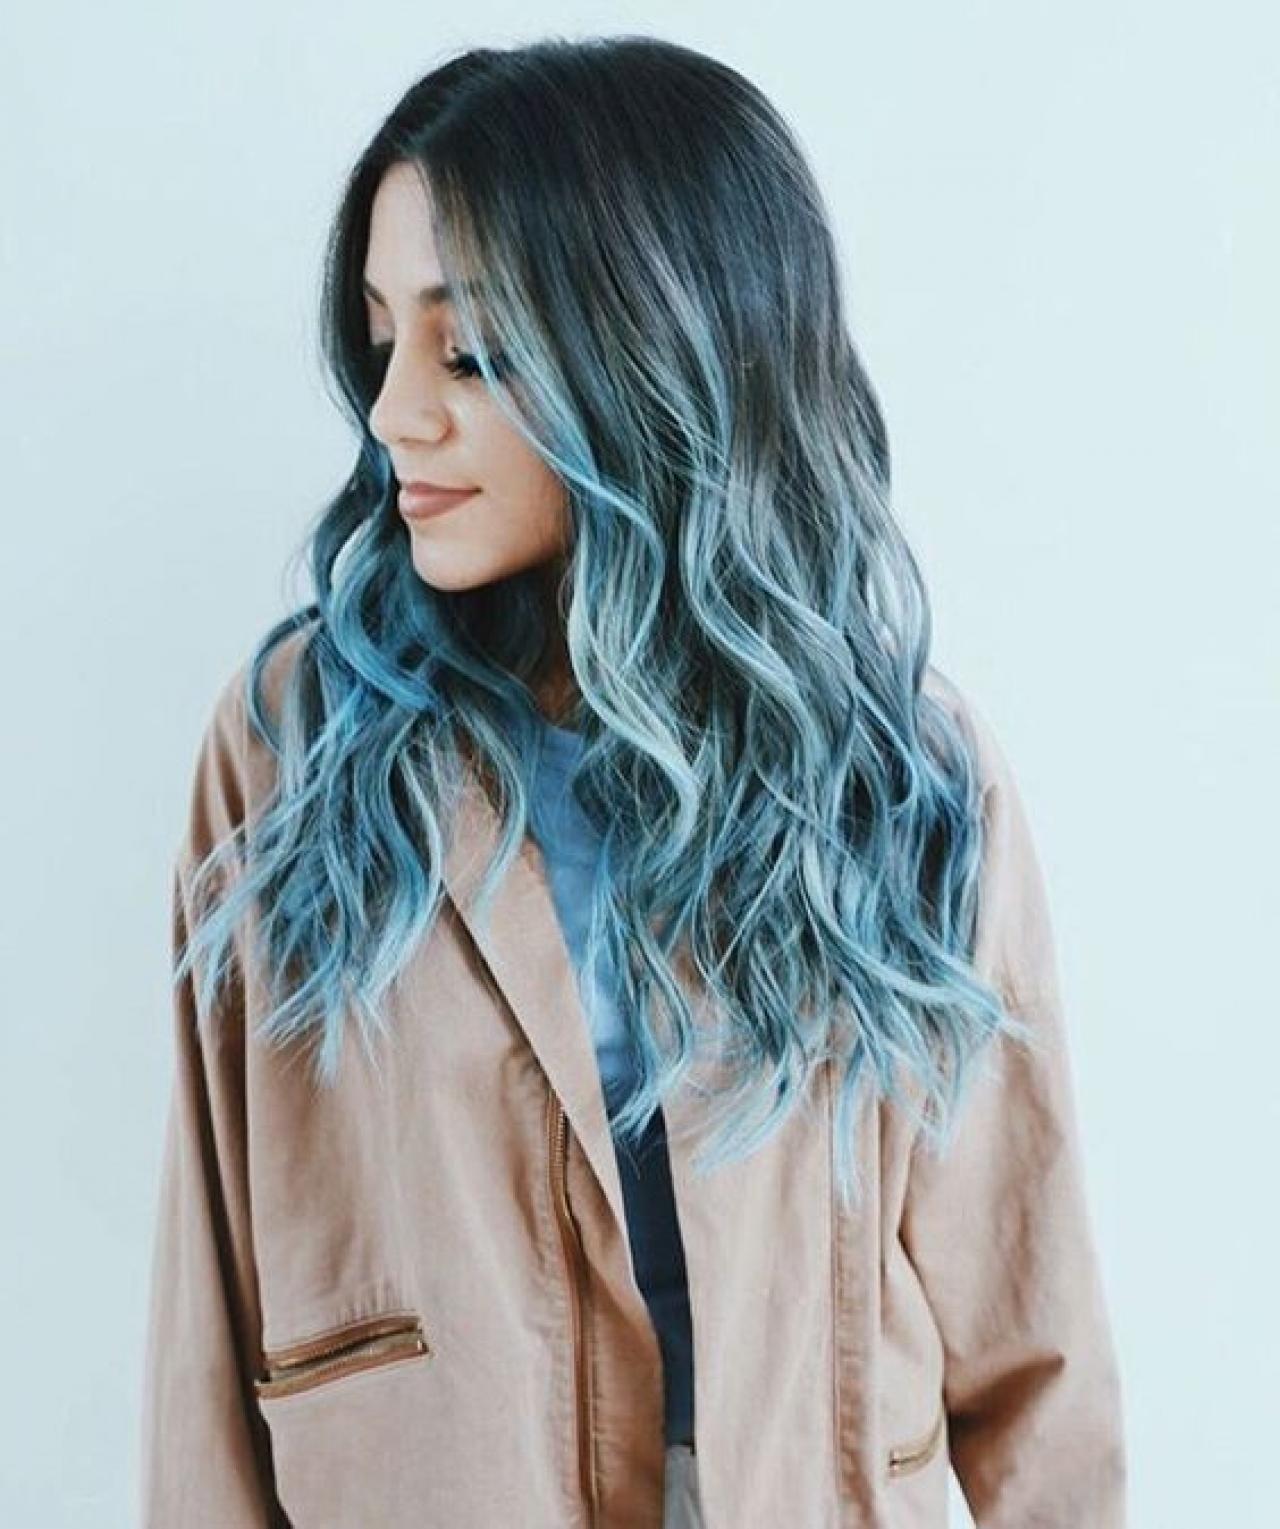 Blue Ombre Hair Hair Pinterest Hair Blue Hair And Hair Styles